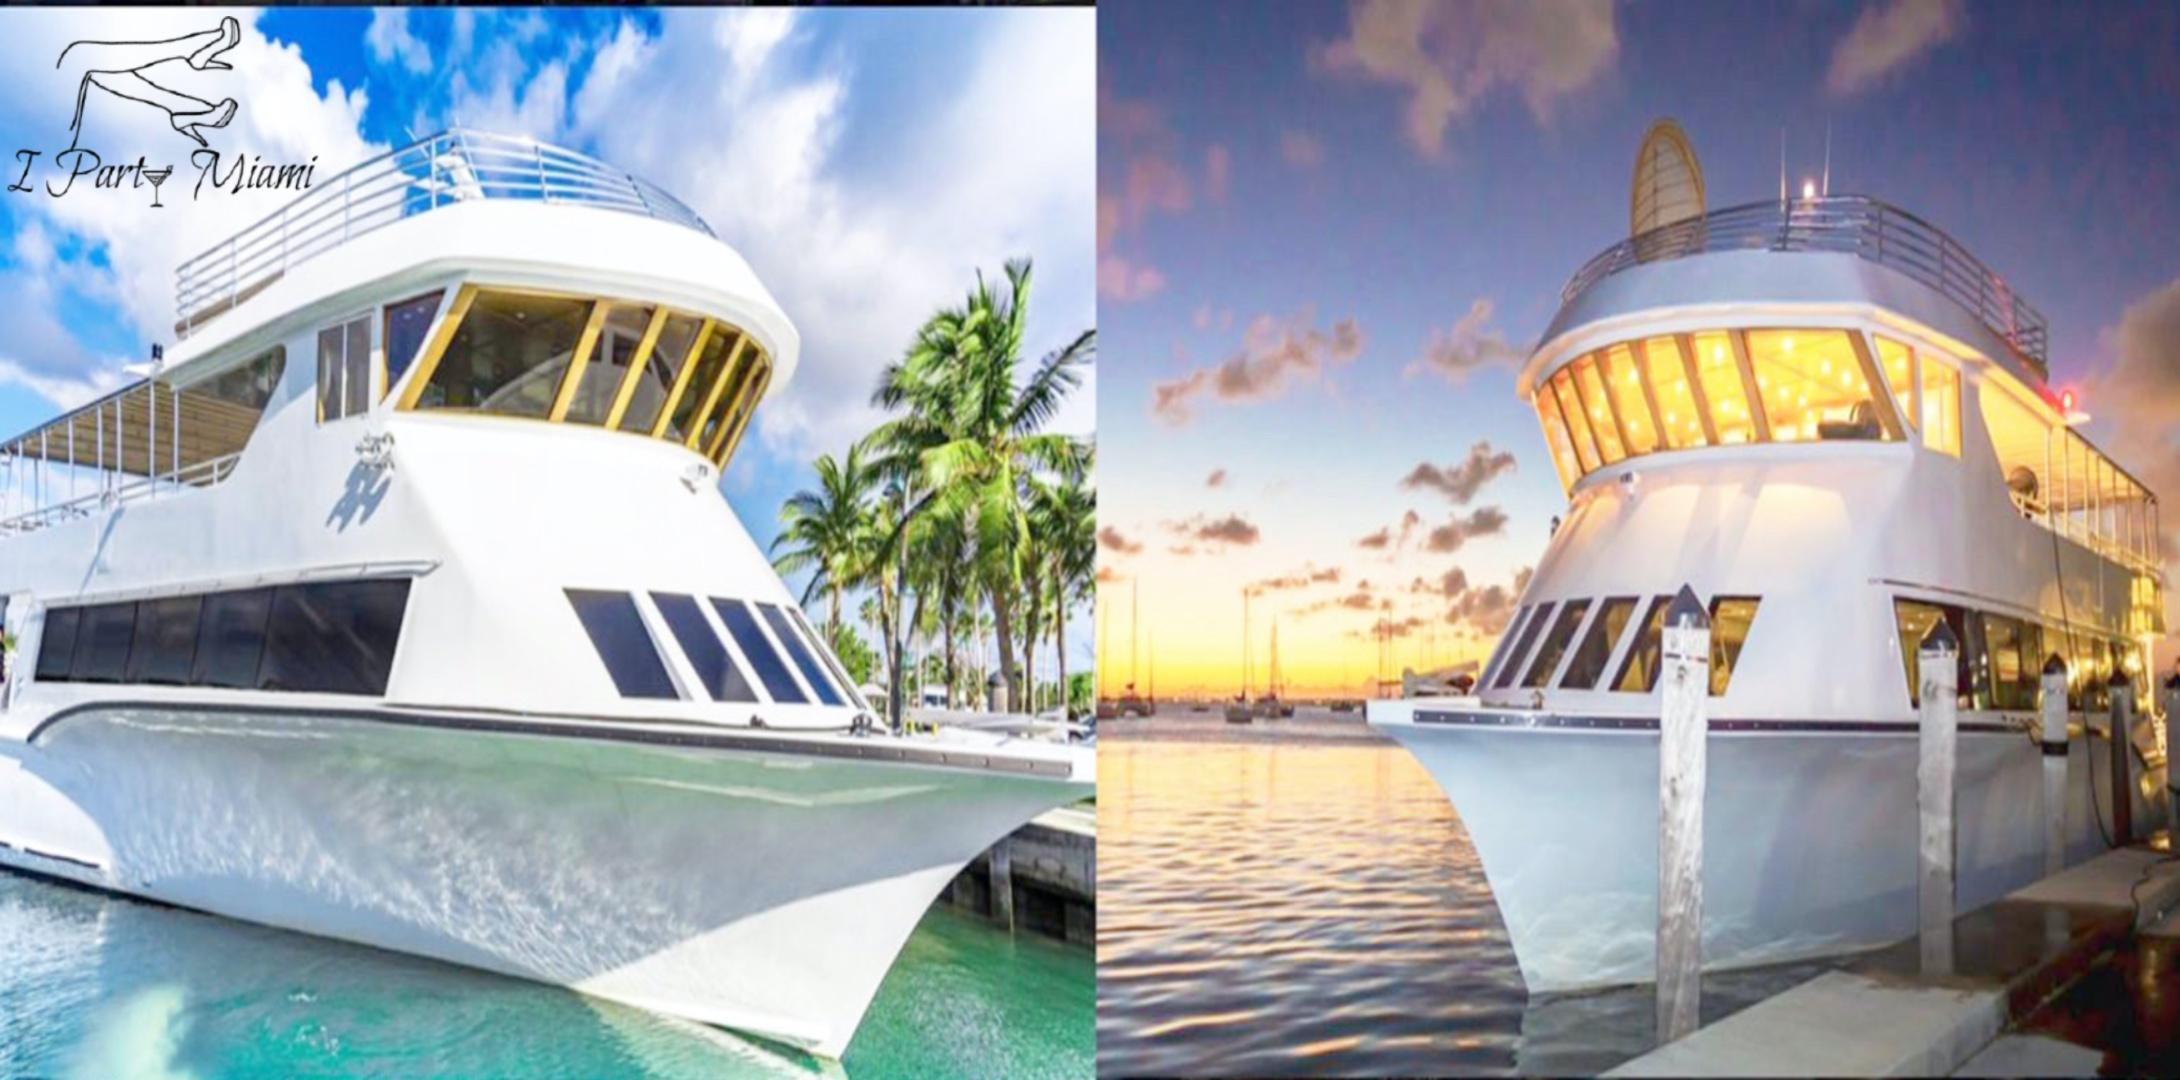 #1 Yacht Party Miami